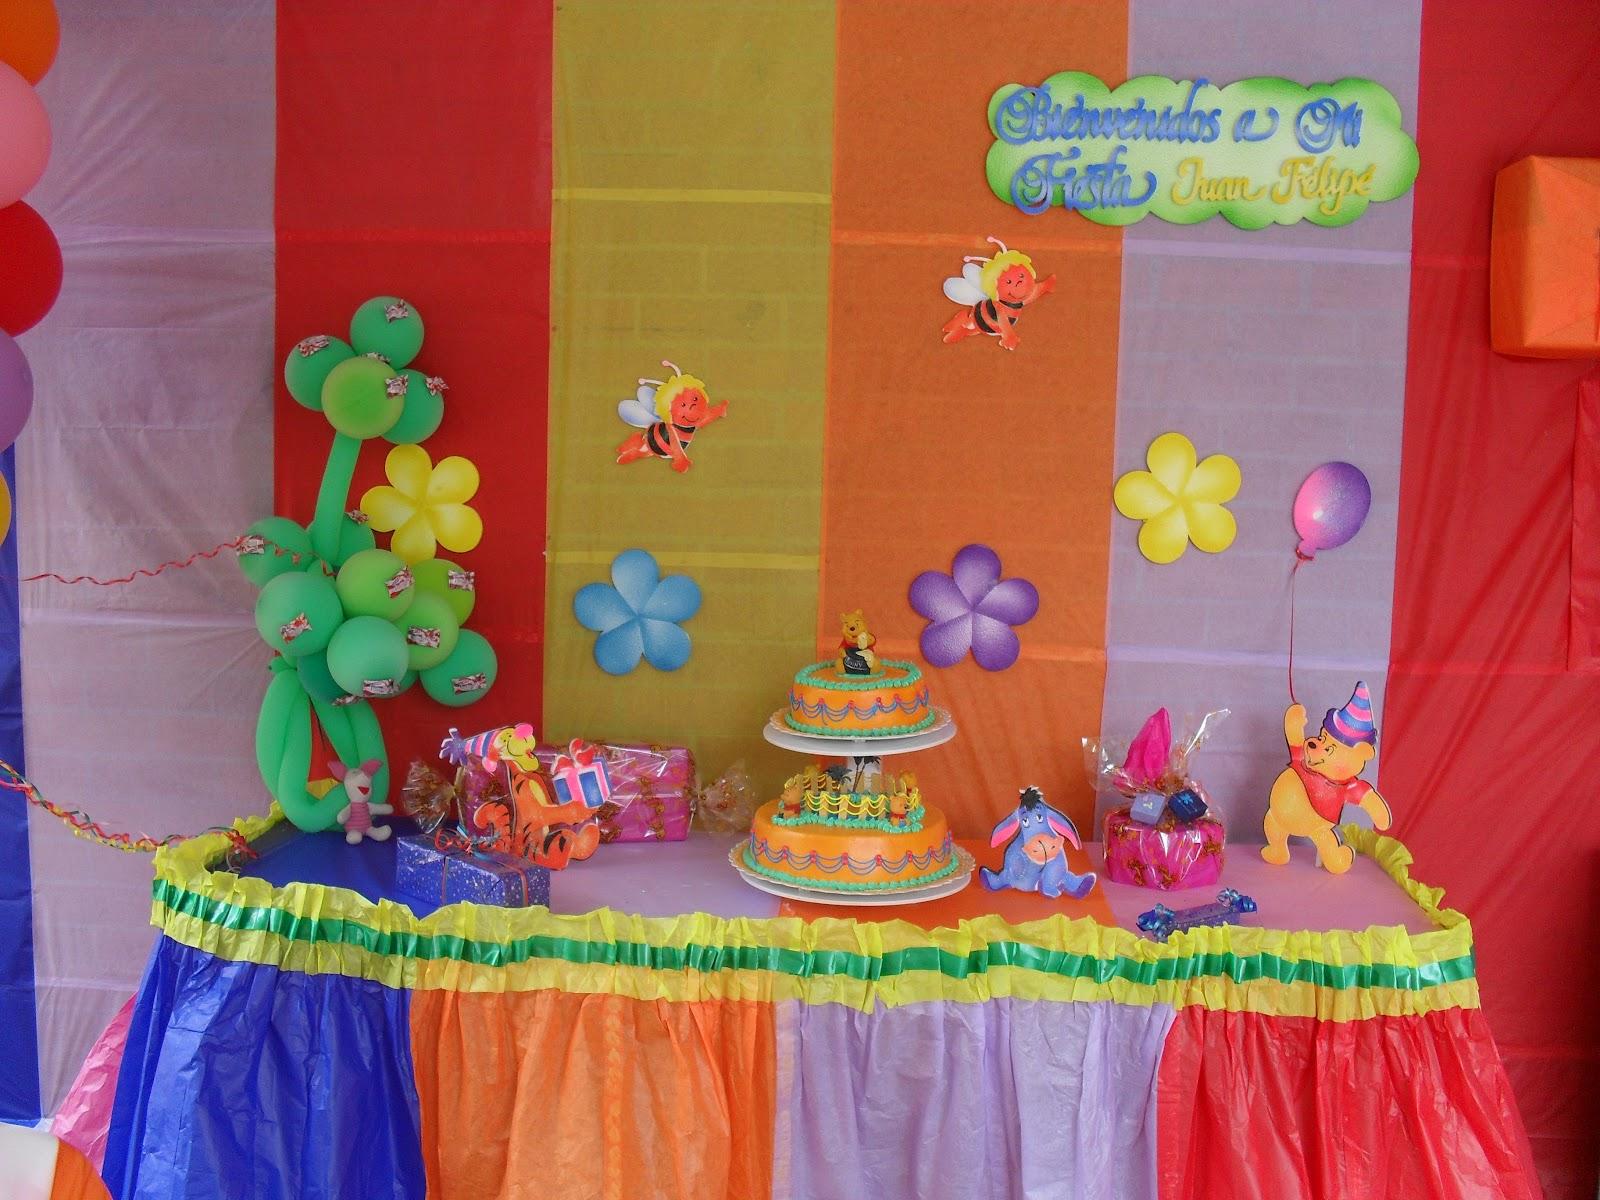 Decoraciones infantiles decoraci n de winnie the pooh for Decoracion winnie pooh para fiesta infantil